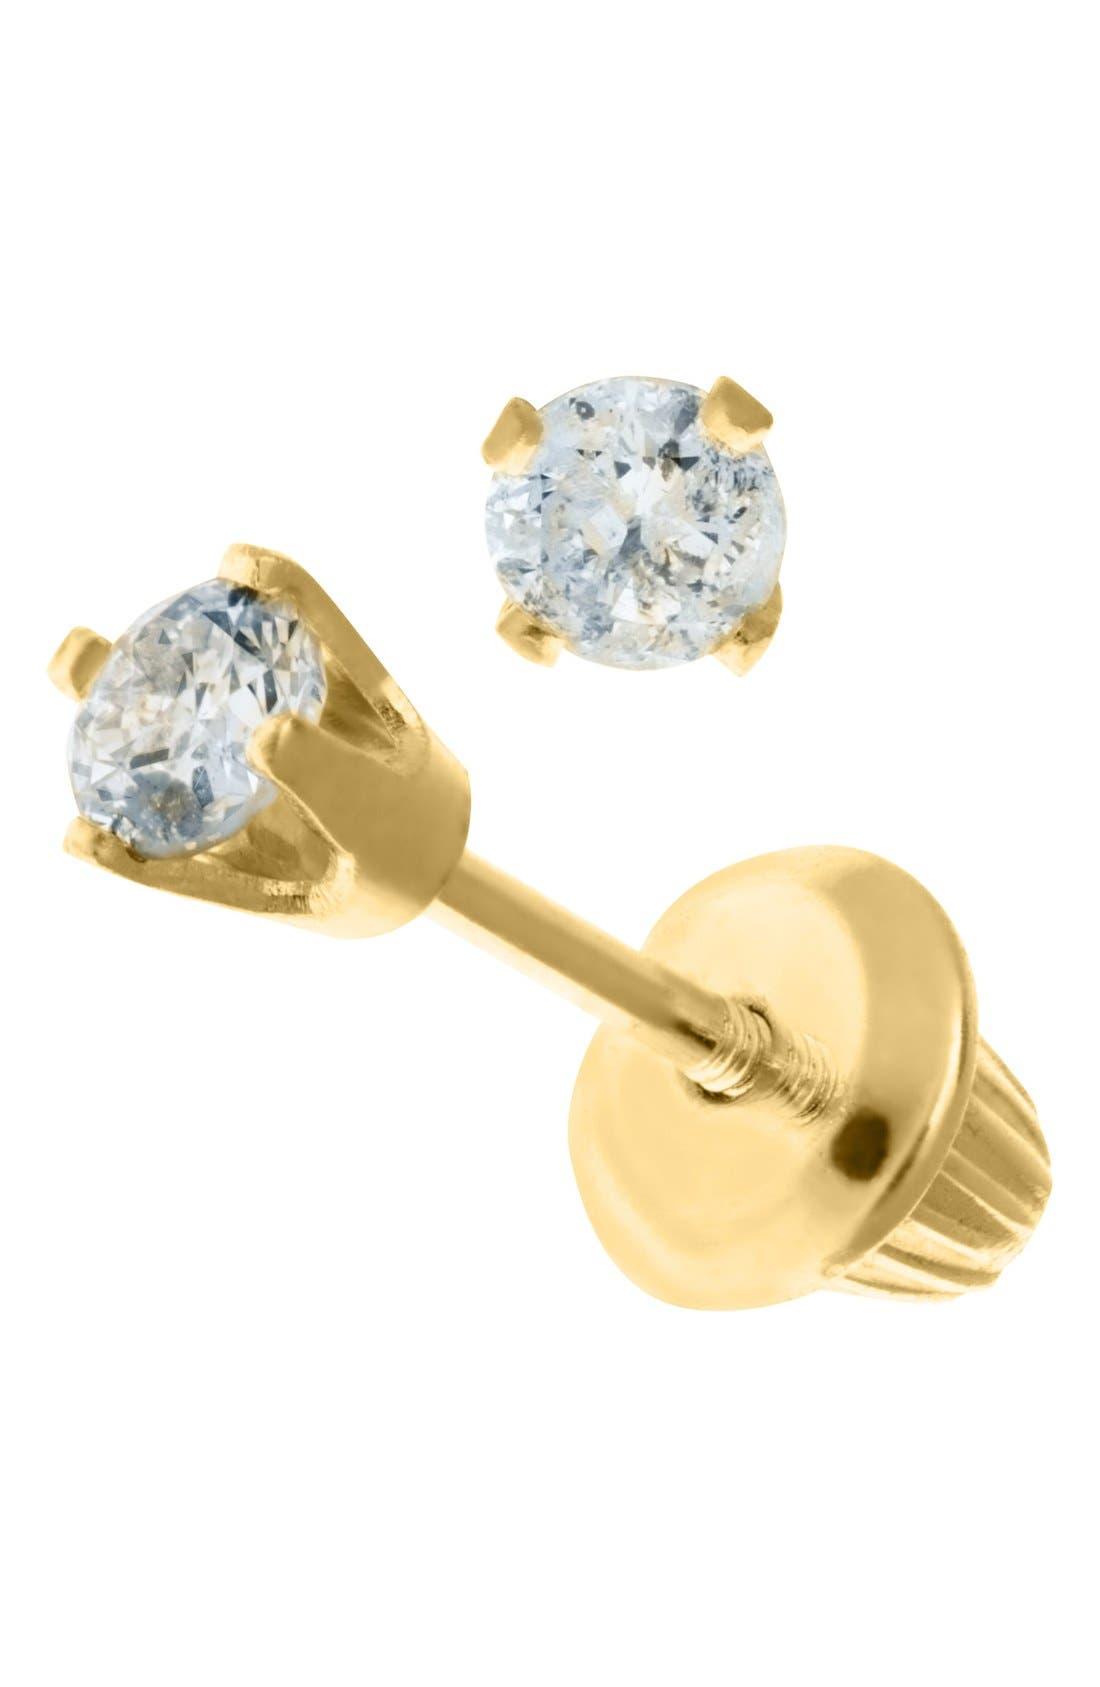 14k Yellow Gold & Diamond Stud Earrings,                             Alternate thumbnail 2, color,                             Gold